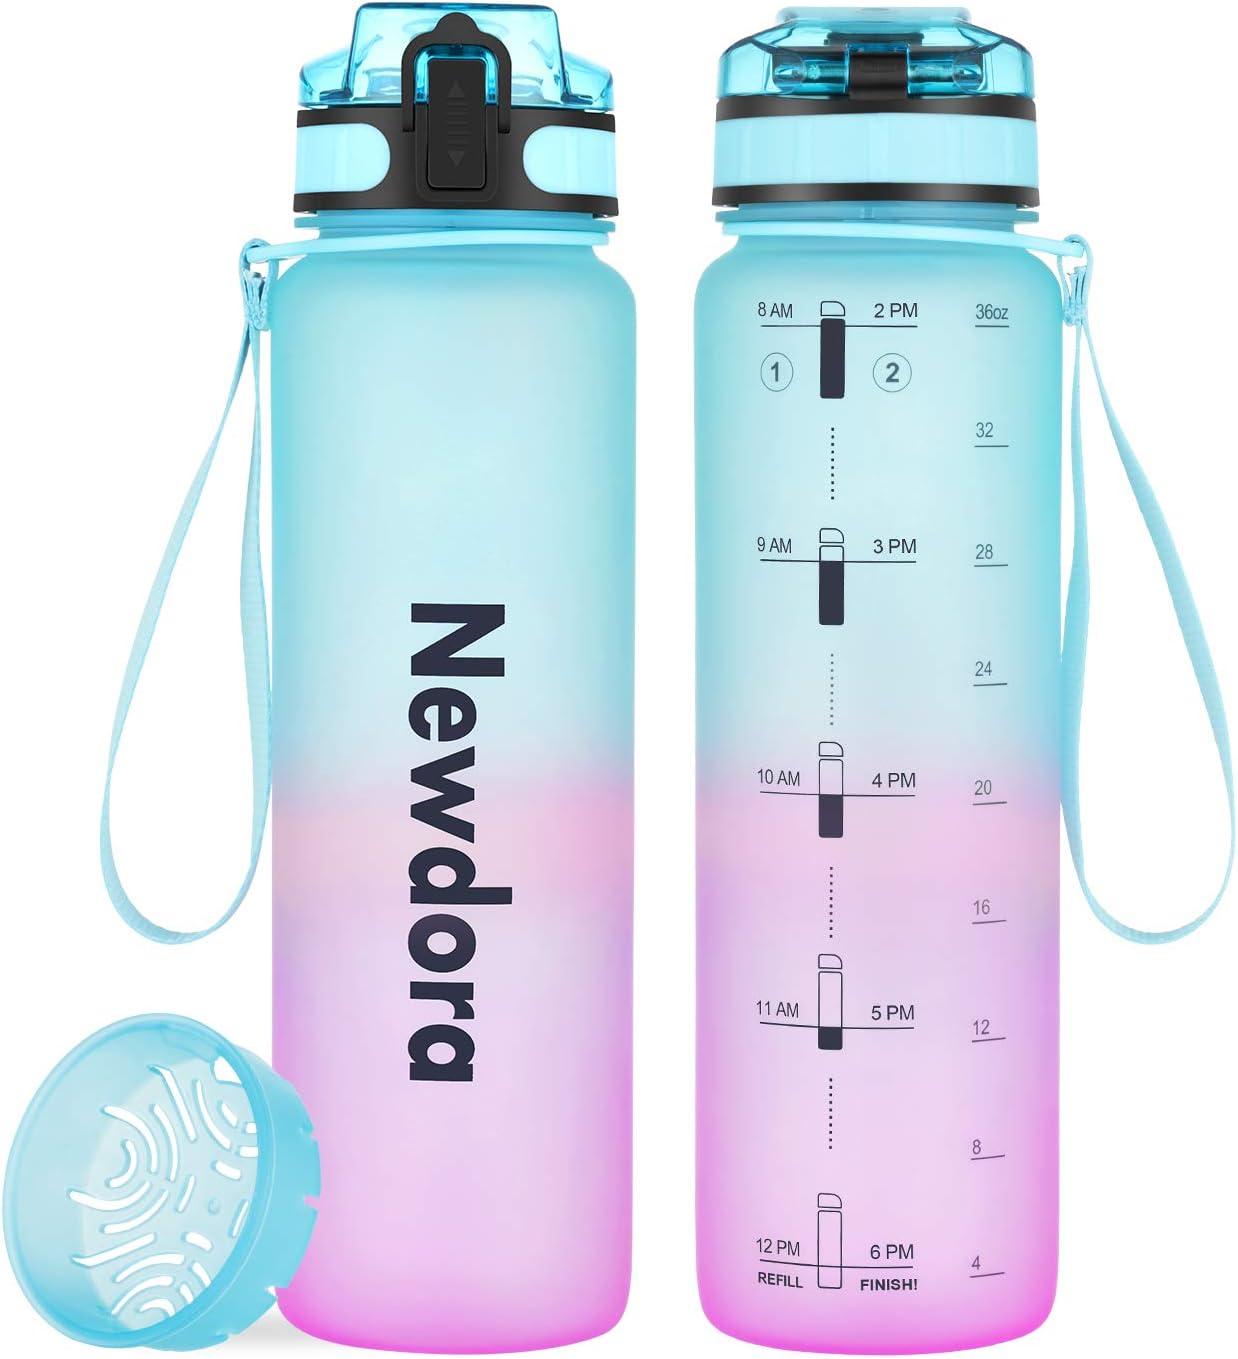 Newdora Botella de Agua Deportiva, 1000ml 650ml, Plástico de Poliéster, Sin BPA, a Prueba de Fugas, Botella Agua Bicicleta, Botella con Filtro, para Viaje, Gimnasio, Correr